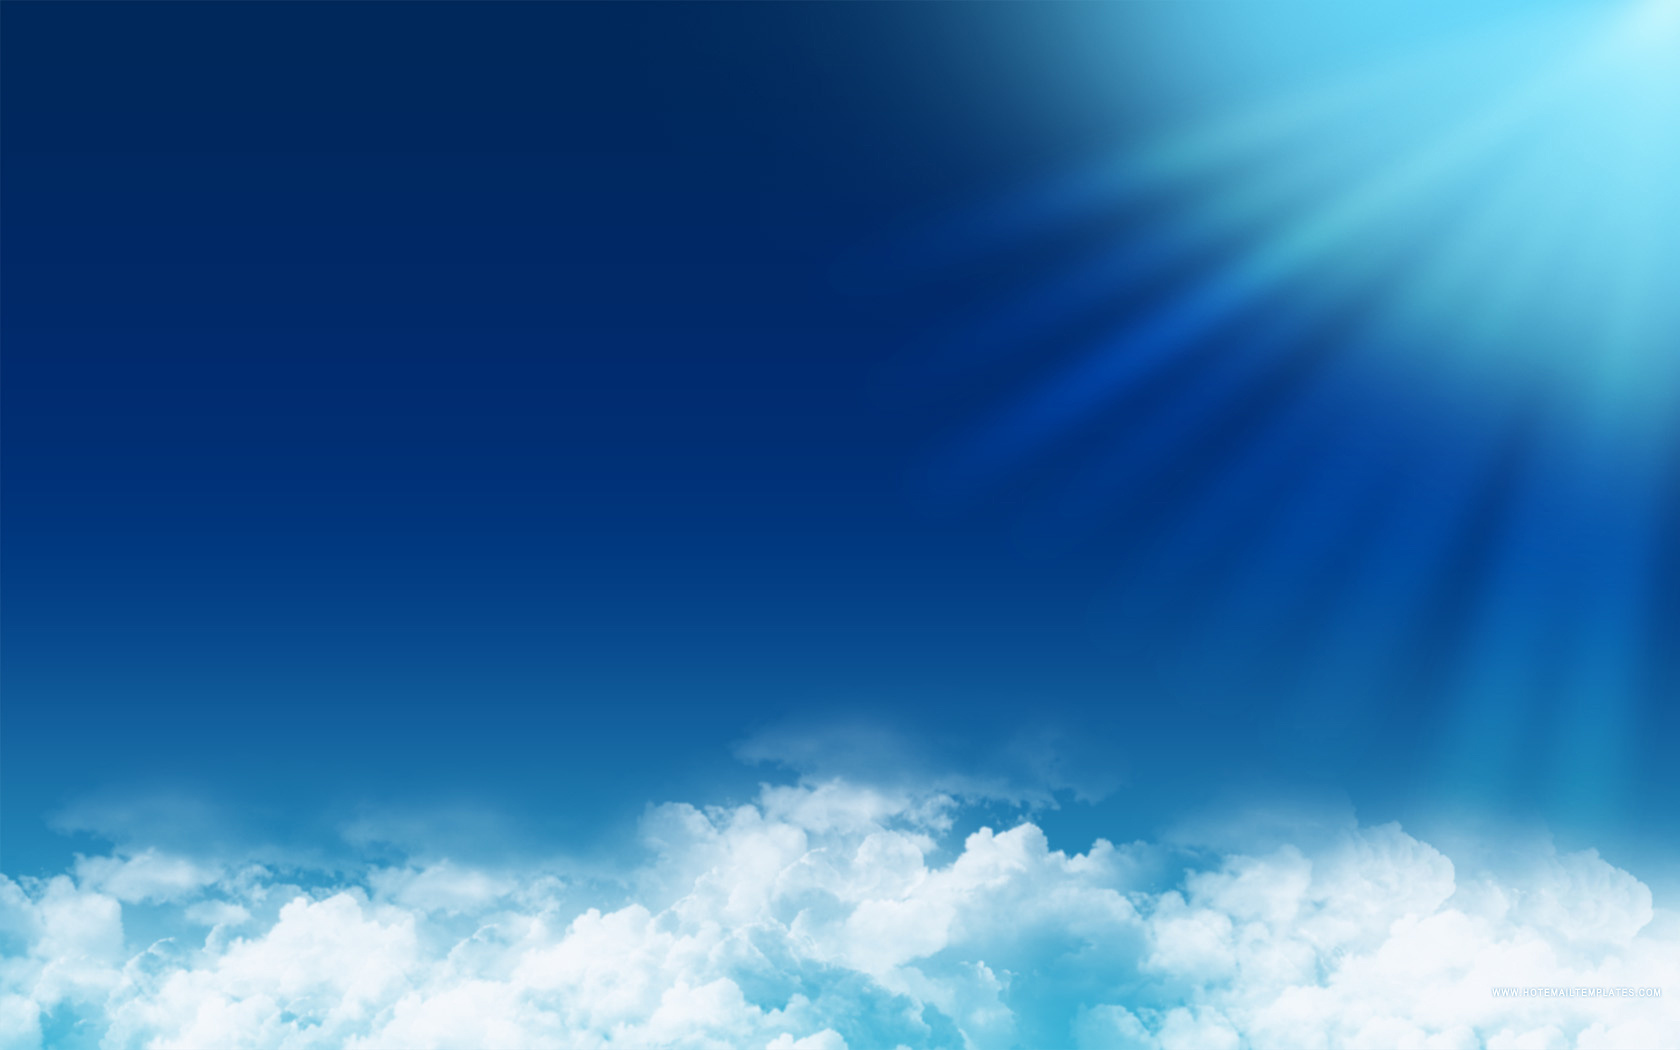 Blue Sky Wallpaper For Pc Best HD Wallpapers 1680x1050